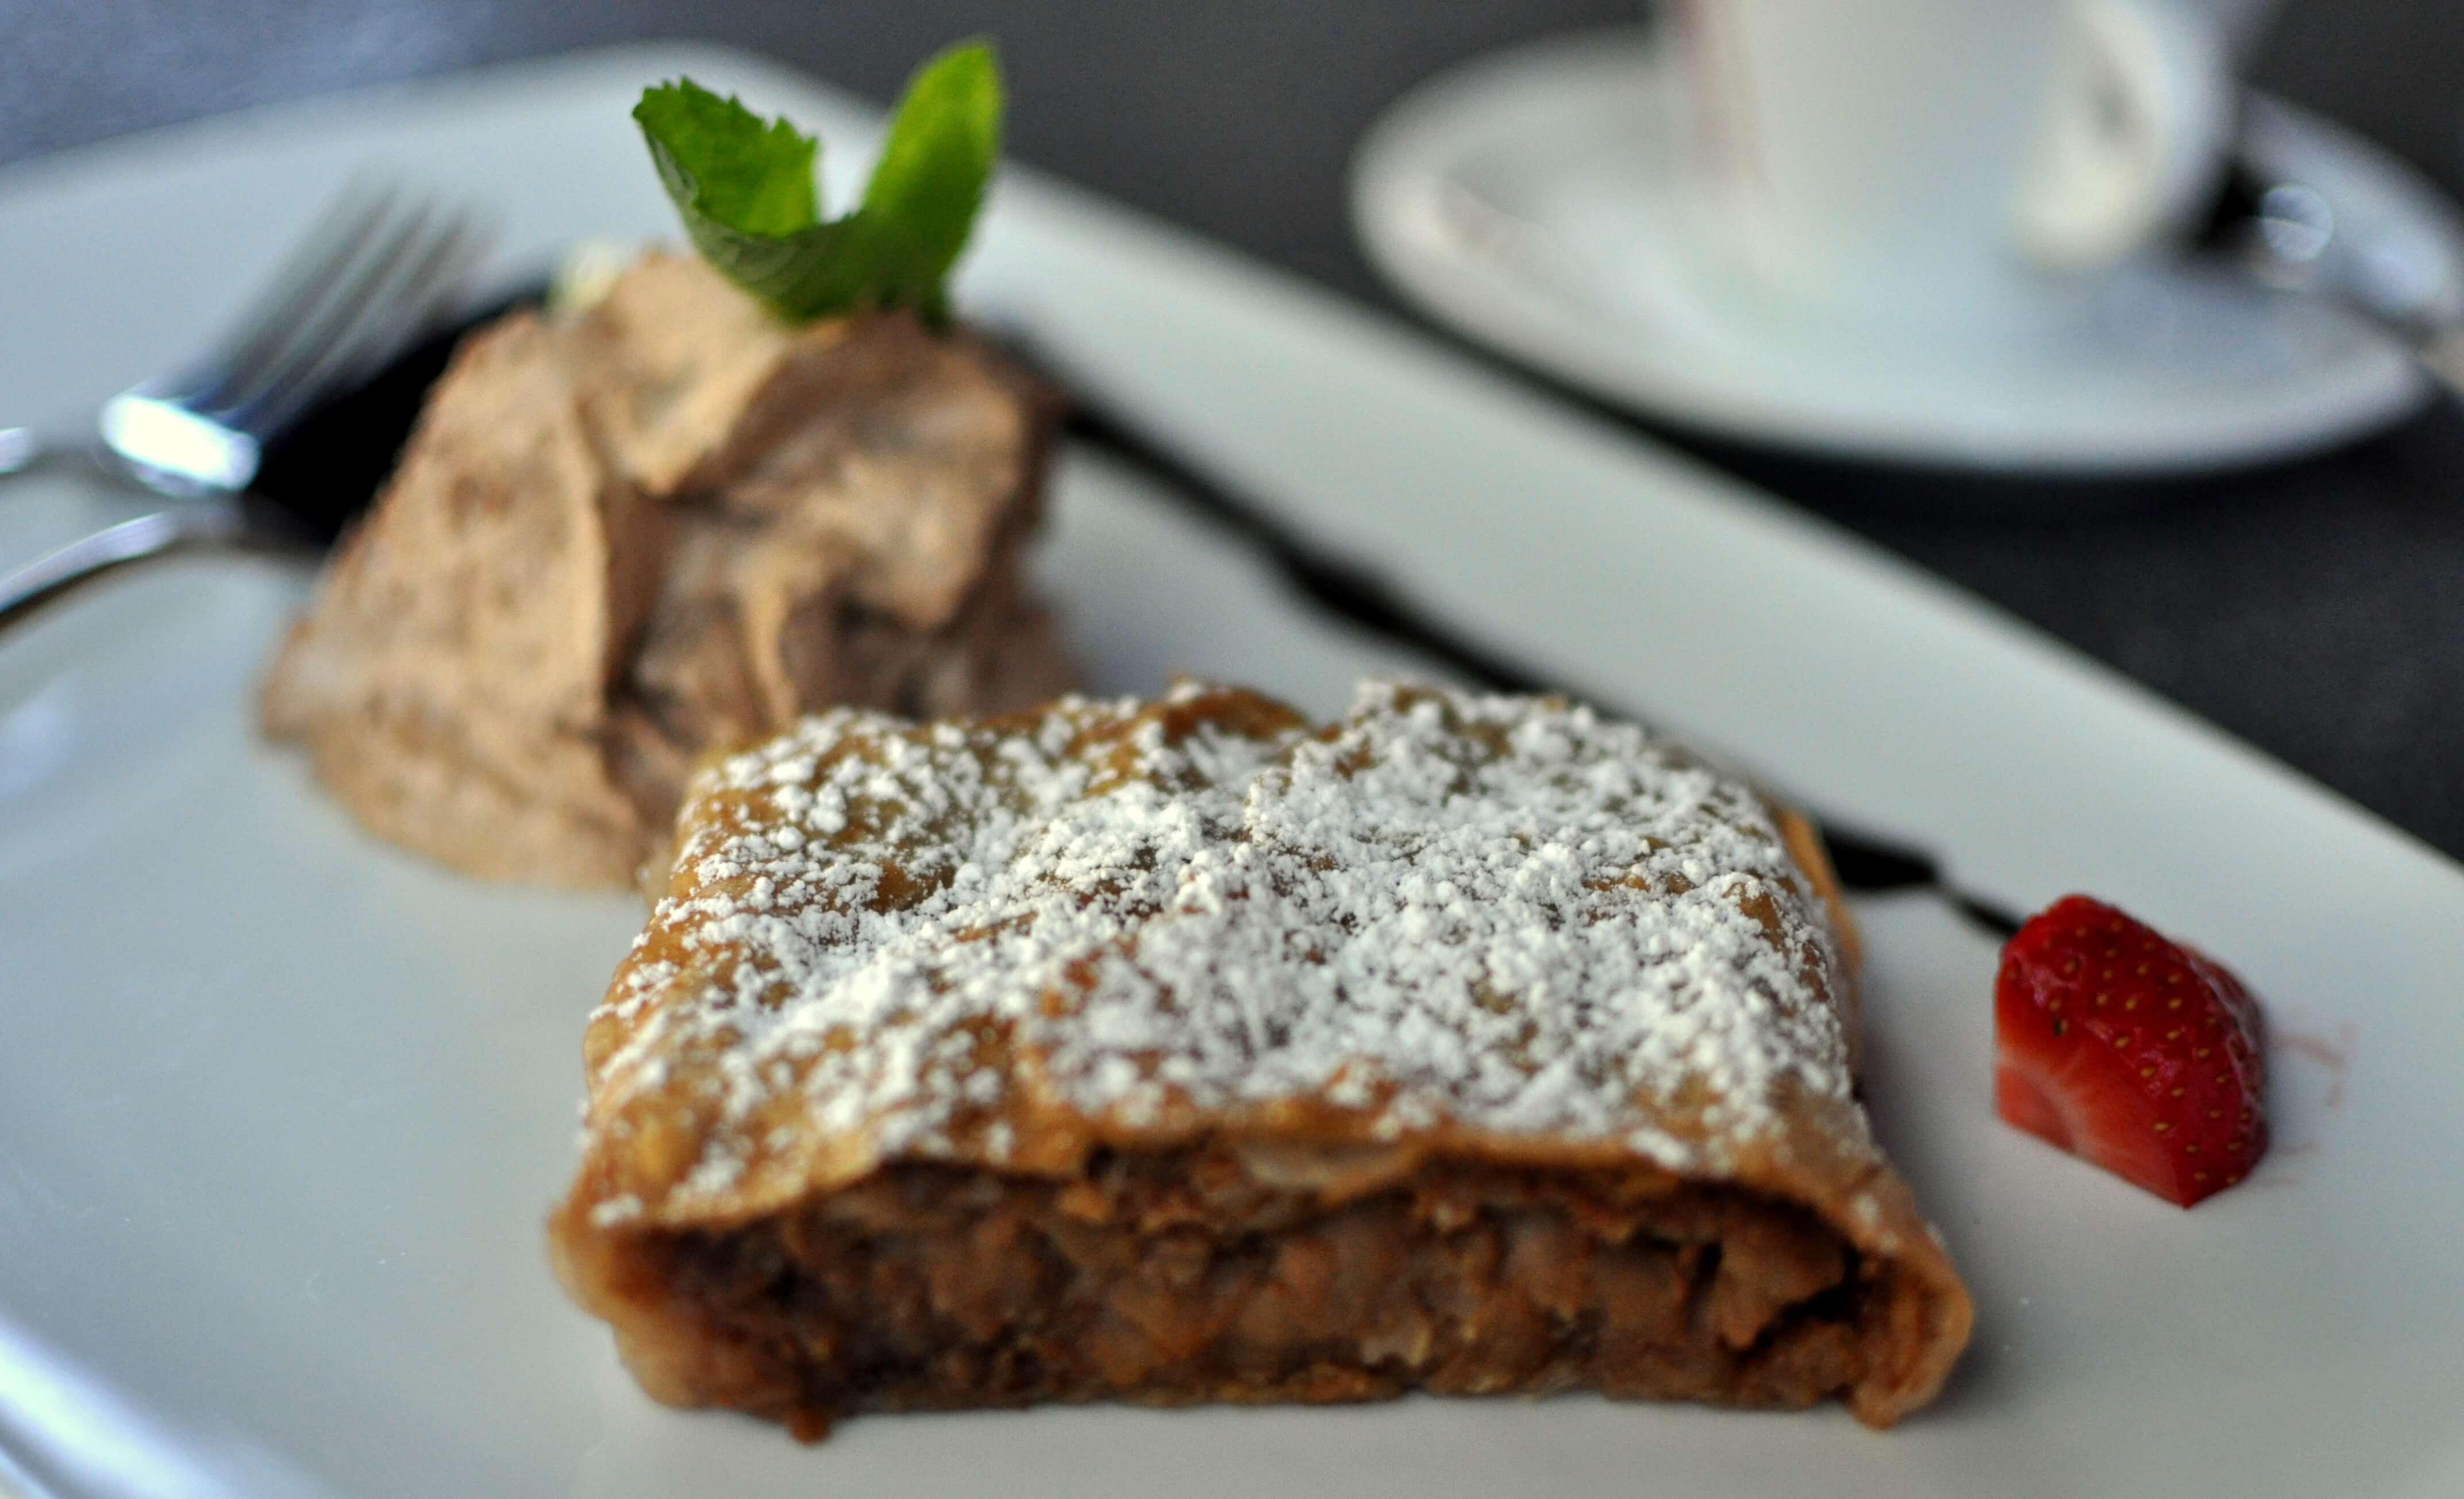 the sweet crusty Apfelstrudel